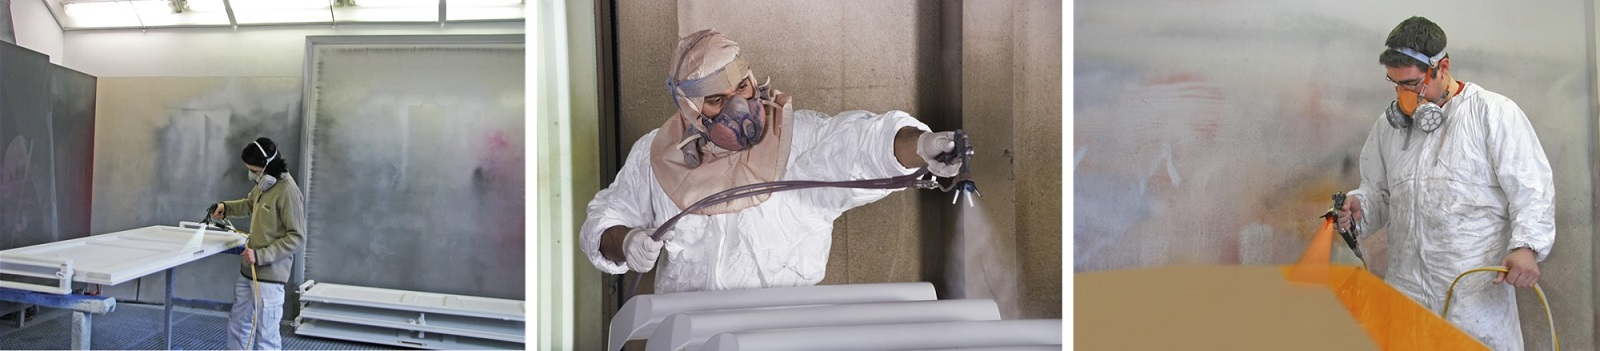 Yorkshire Spray Services Ltd_Puma 21:110